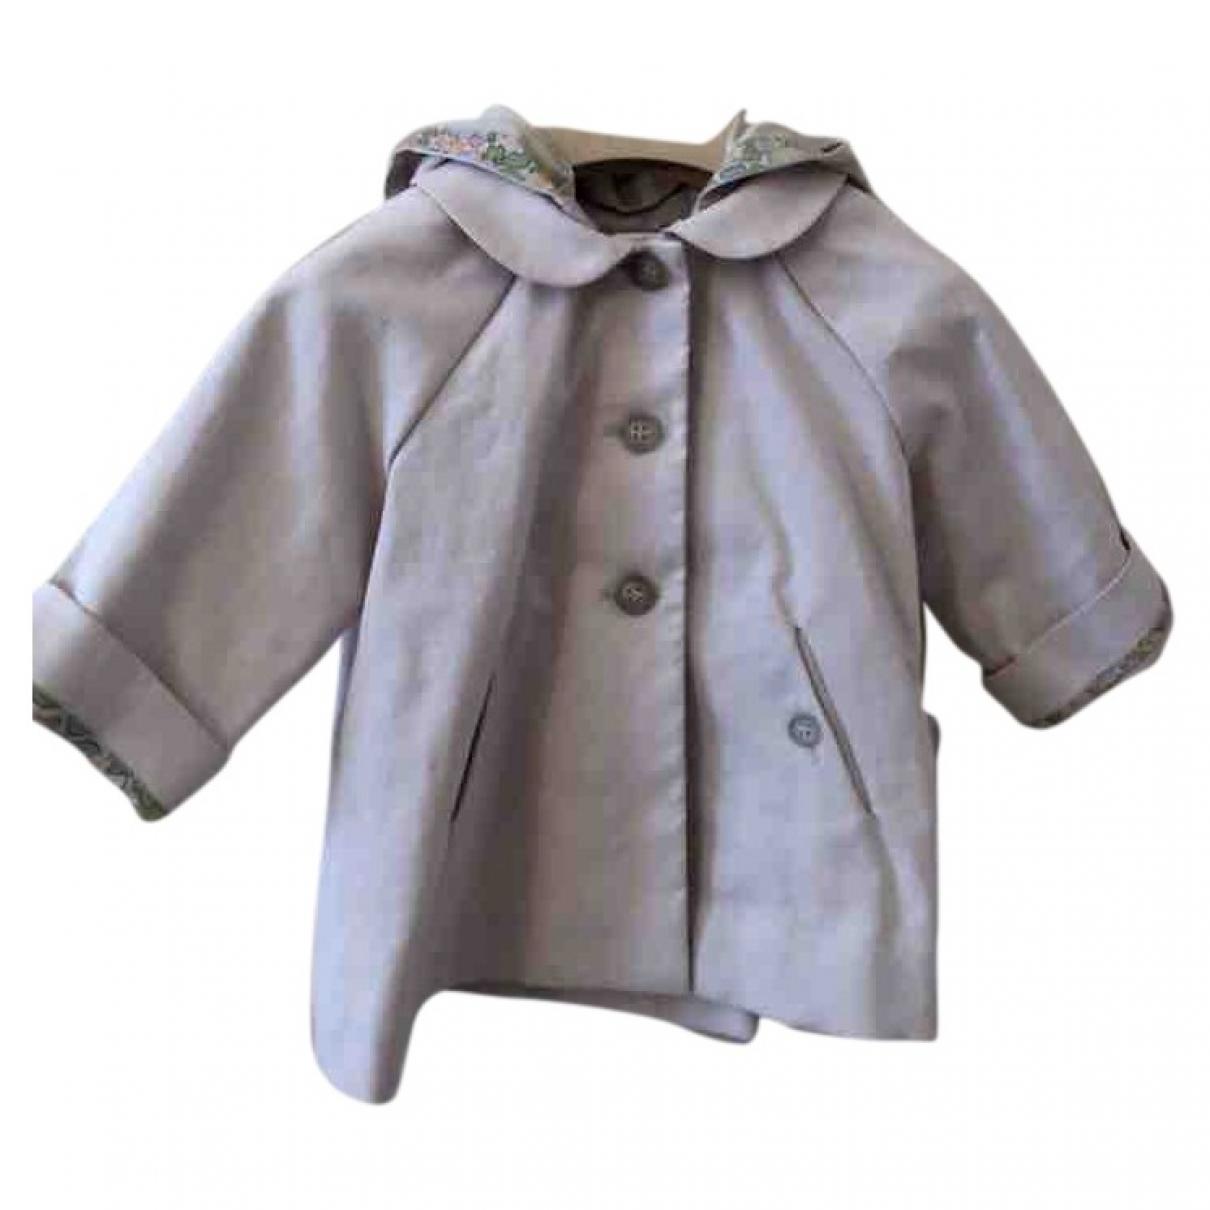 Bonpoint \N Pink Cotton jacket & coat for Kids 12 months - up to 74cm FR